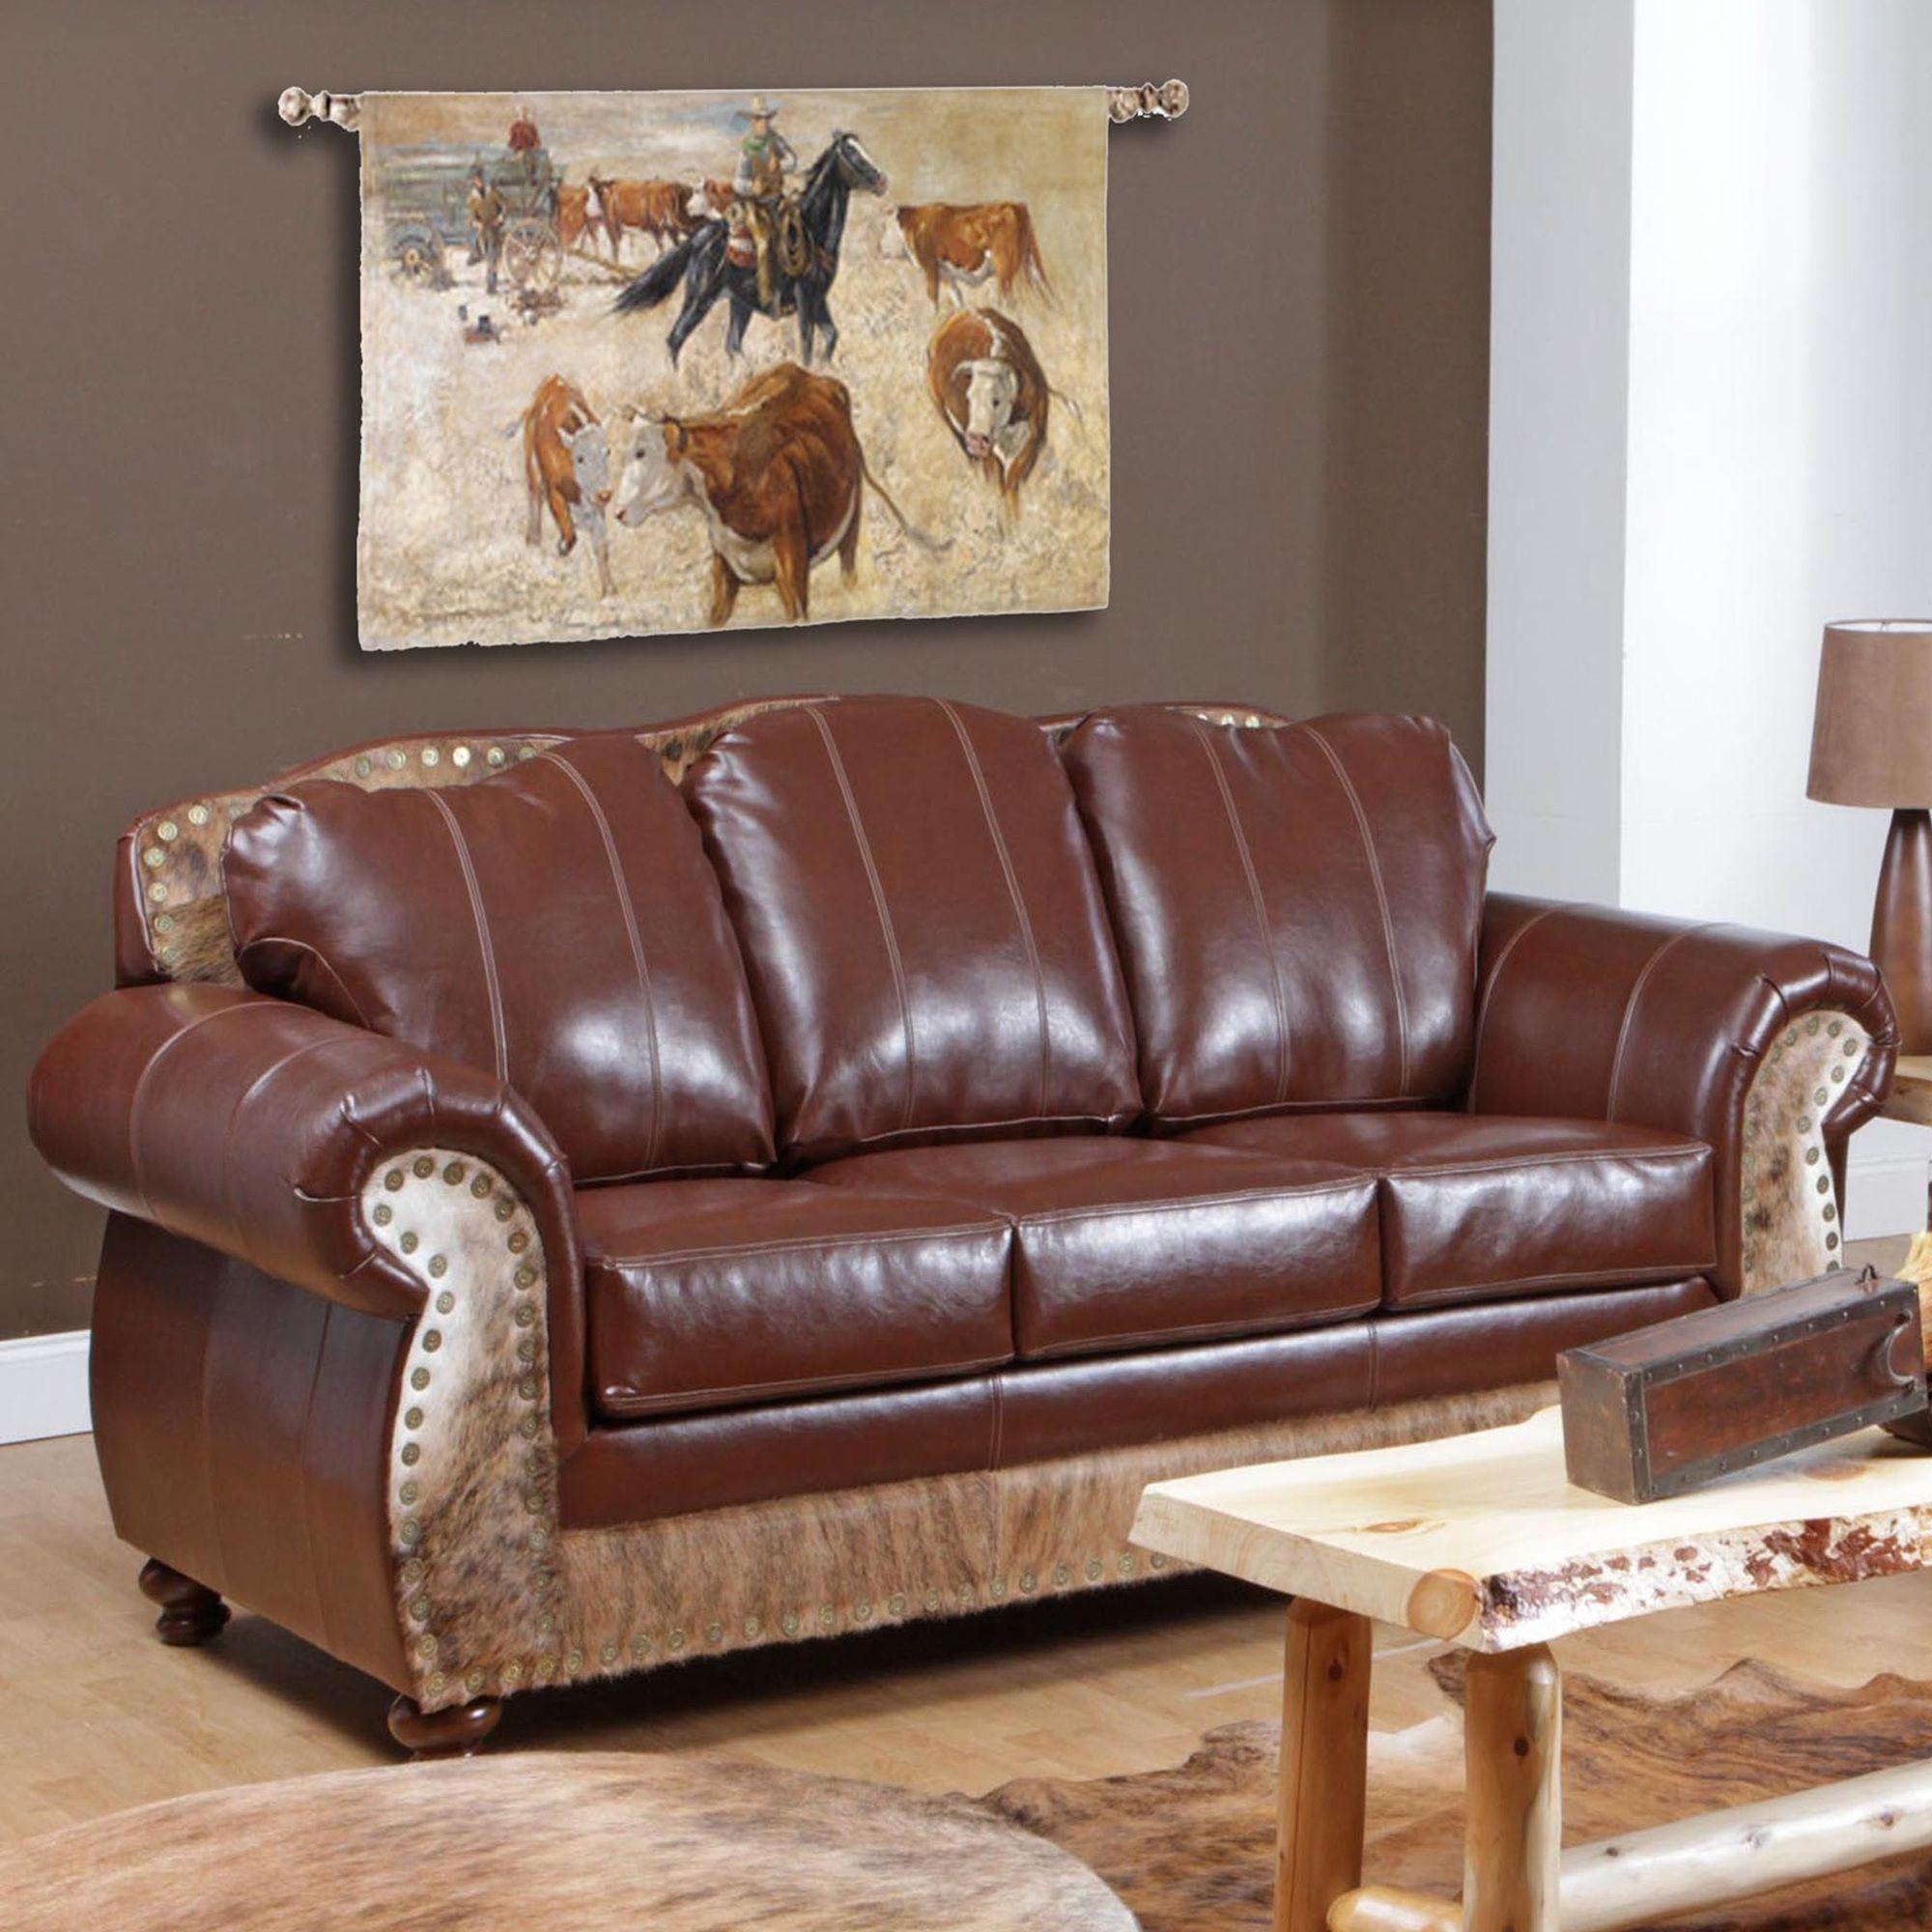 Saddle Me Up Grain Leather Sofa Top Grain Leather Sofa Leather Sofa Italian Leather Sofa